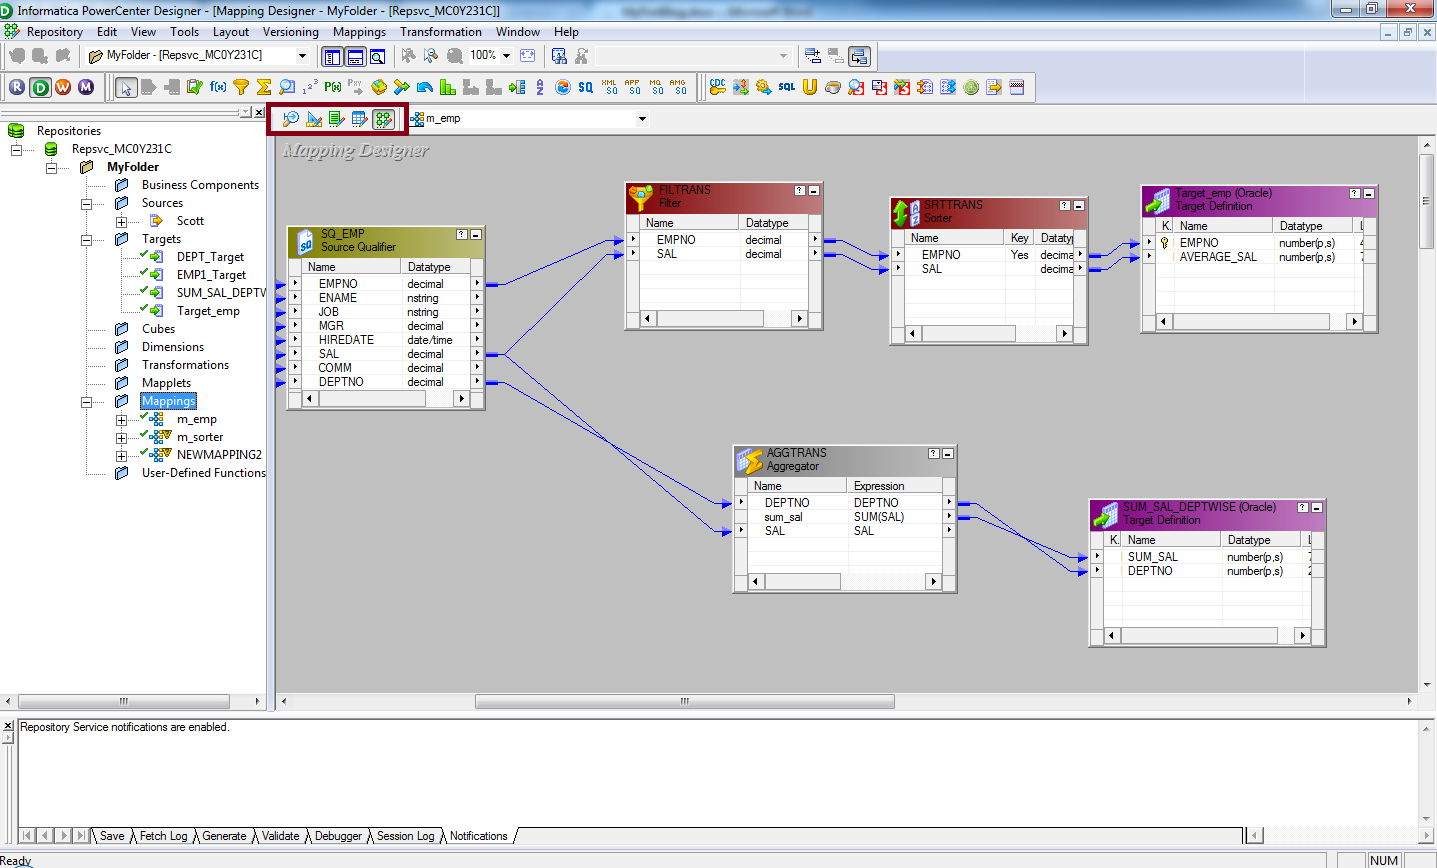 Data modeling in Informatica PowerCenter